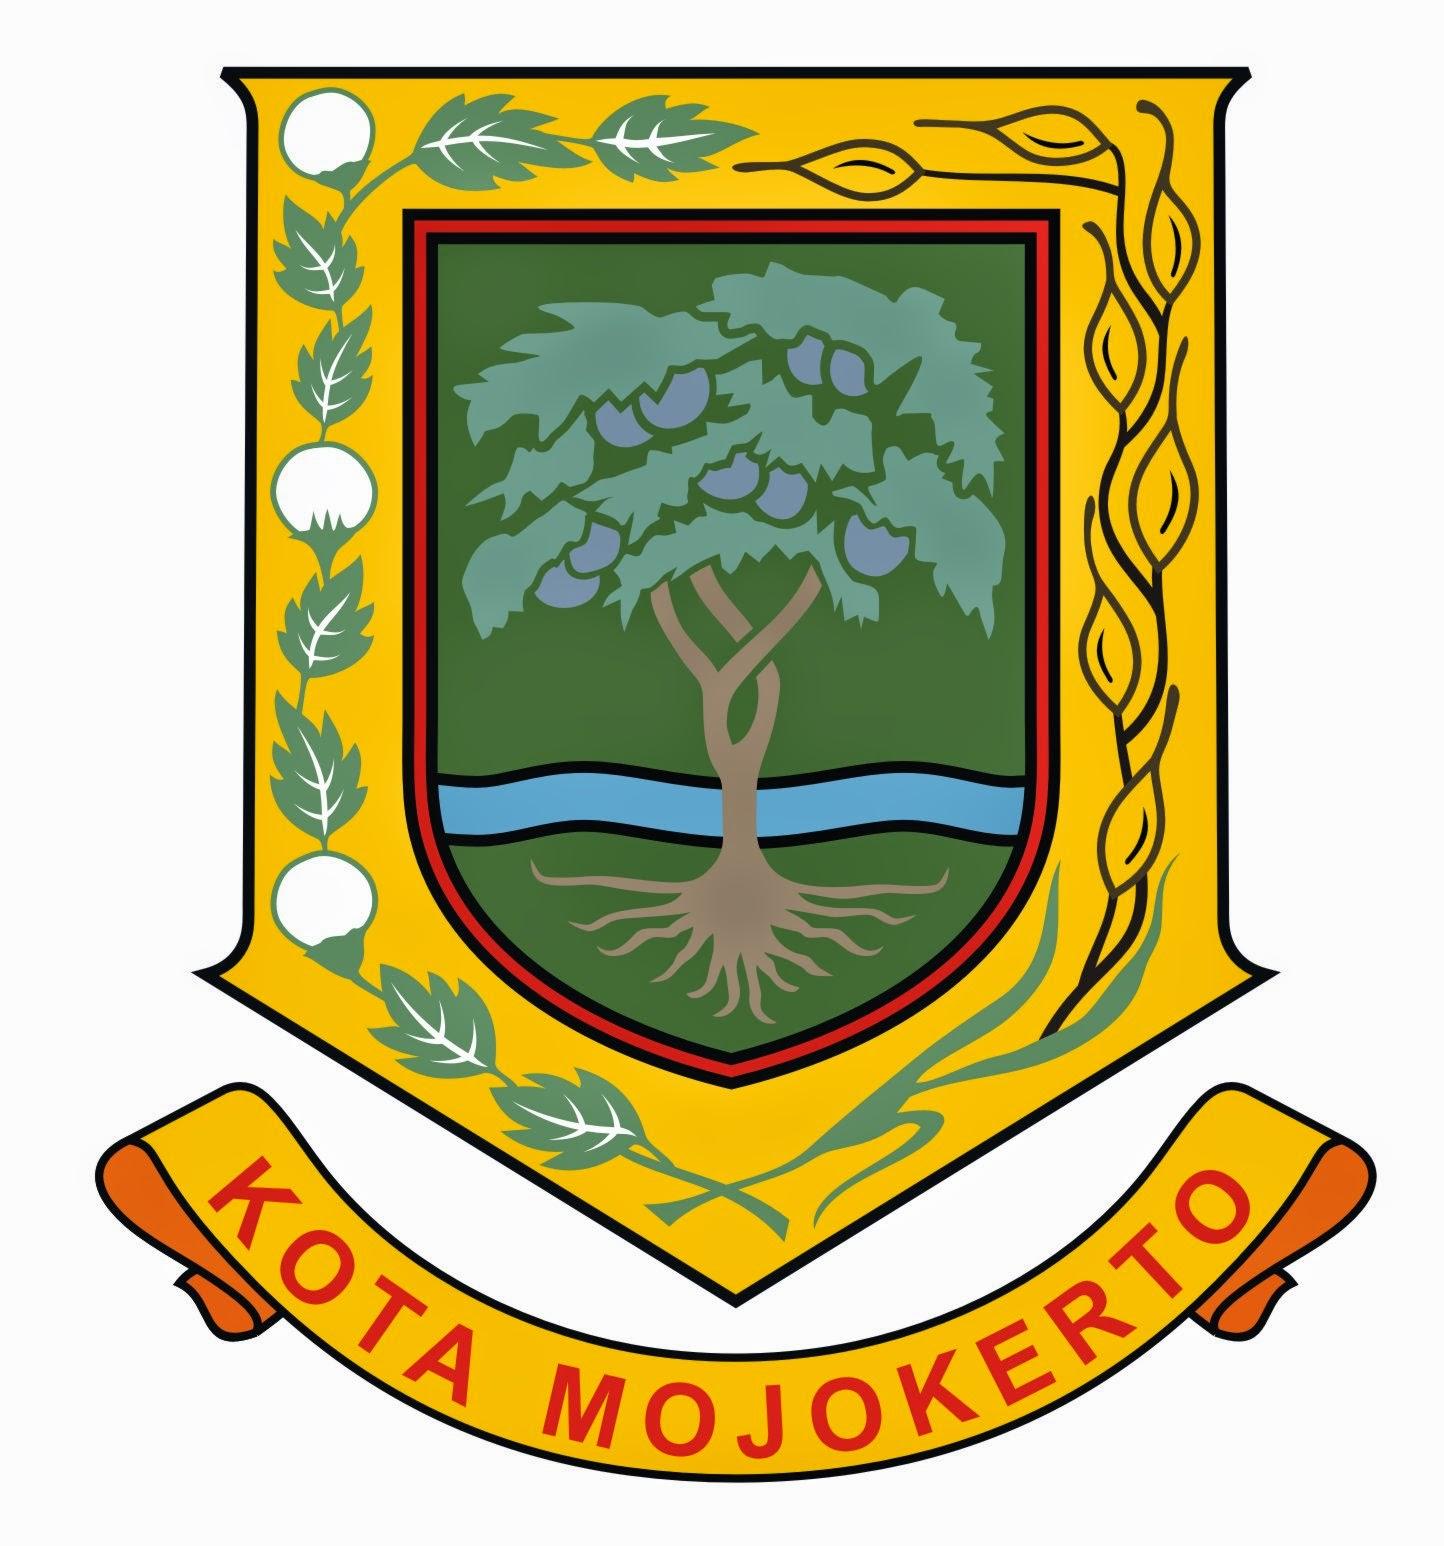 Nama-Nama Yang Lulus CPNS Kota Mojokerto 2014